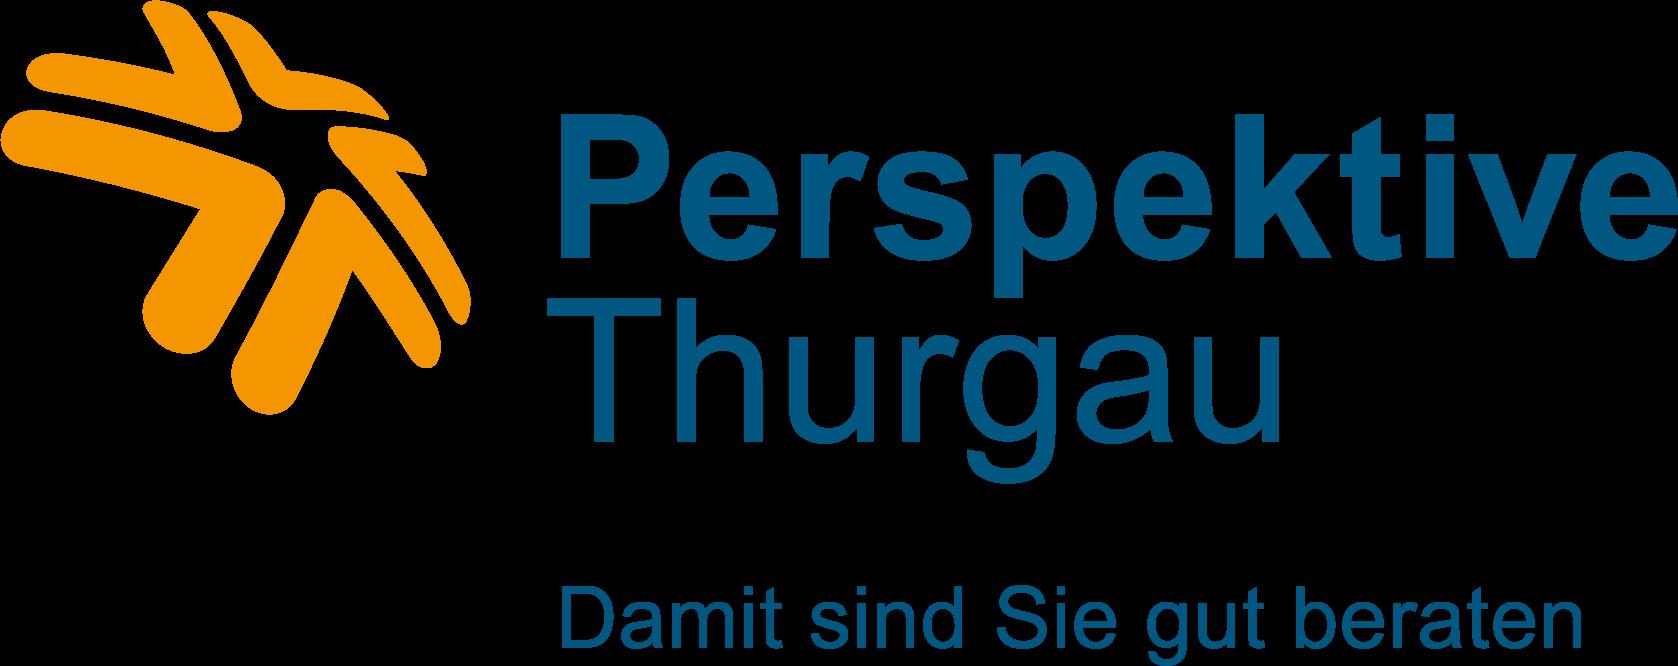 http://recoverycollege-ostschweiz.ch/wp-content/uploads/2020/05/perspektiveTG_logo_claim_cmyk.png